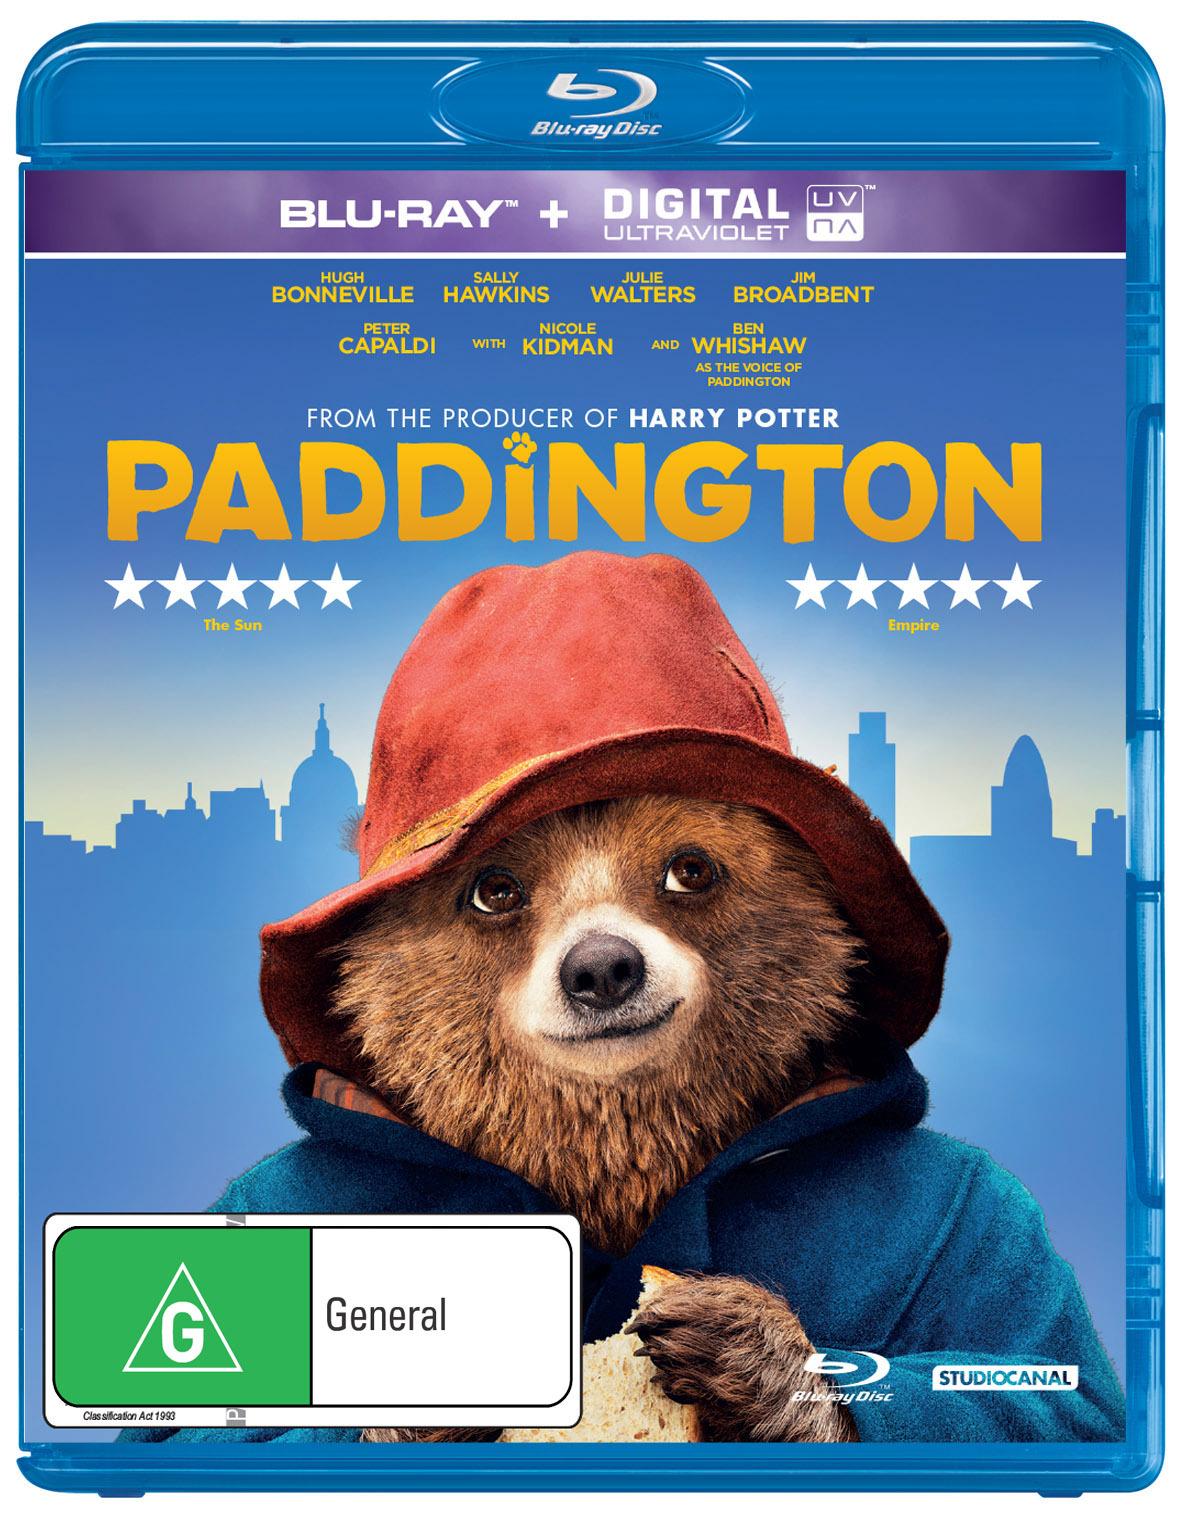 Paddington on Blu-ray image